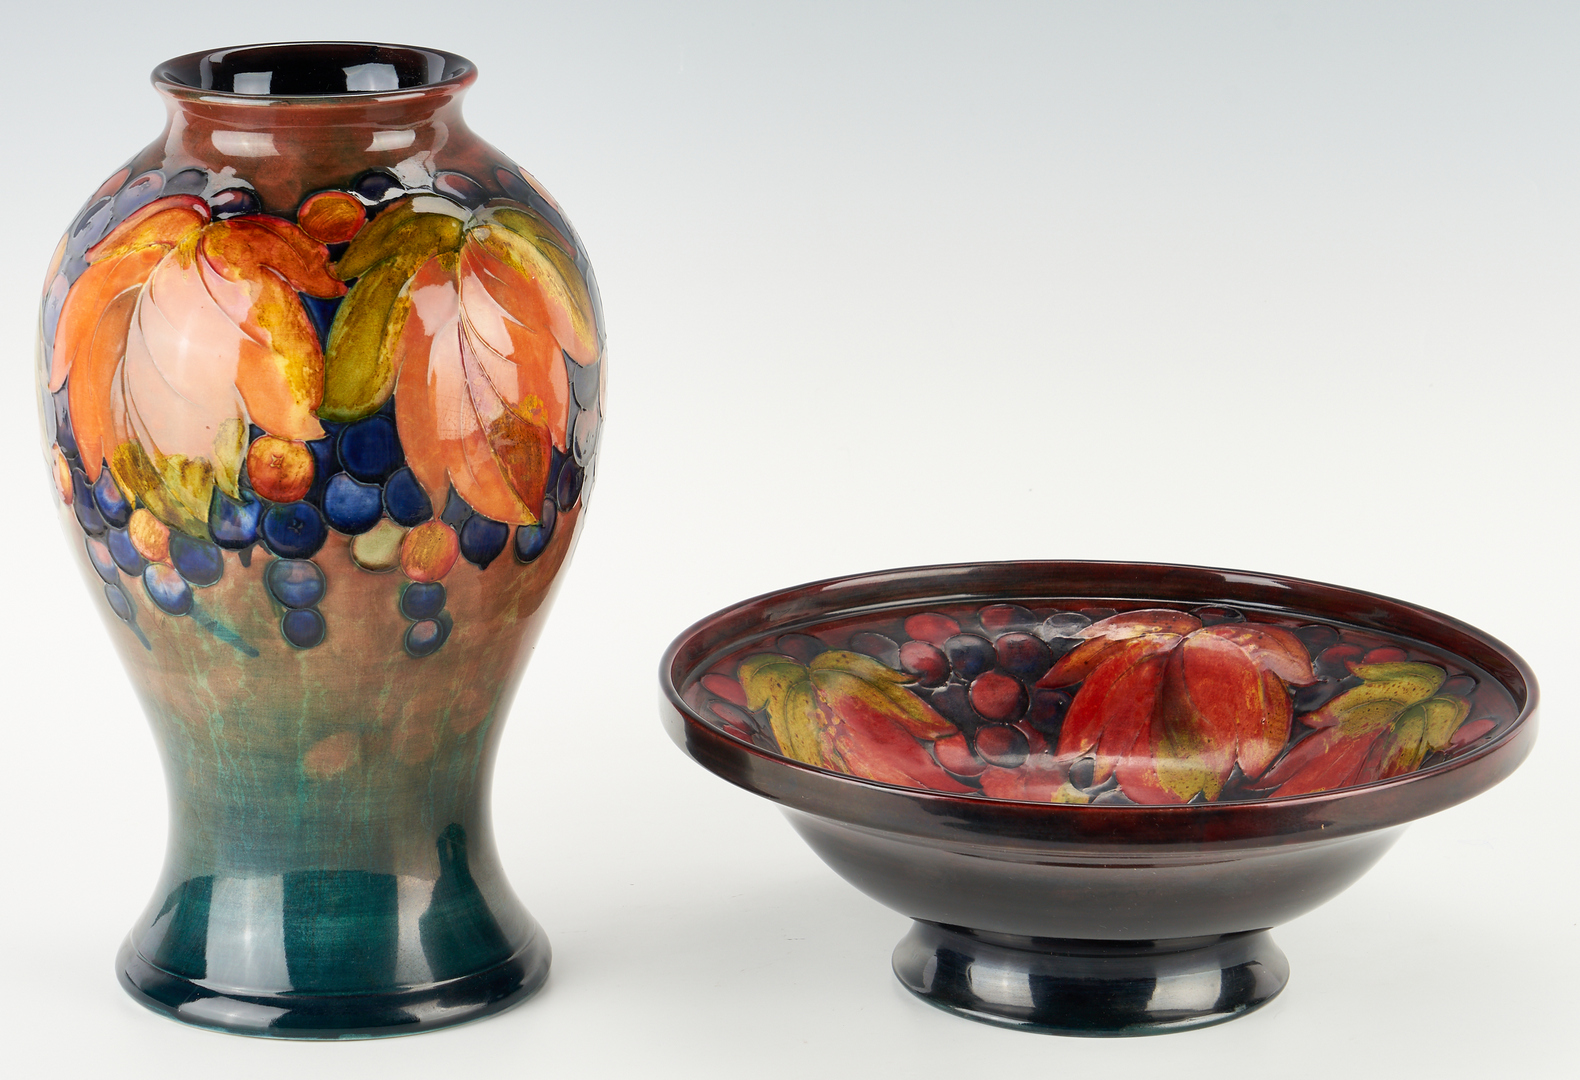 Lot 518: Moorcroft Art Pottery Flambe Grape Vase & Bowl, 2 items